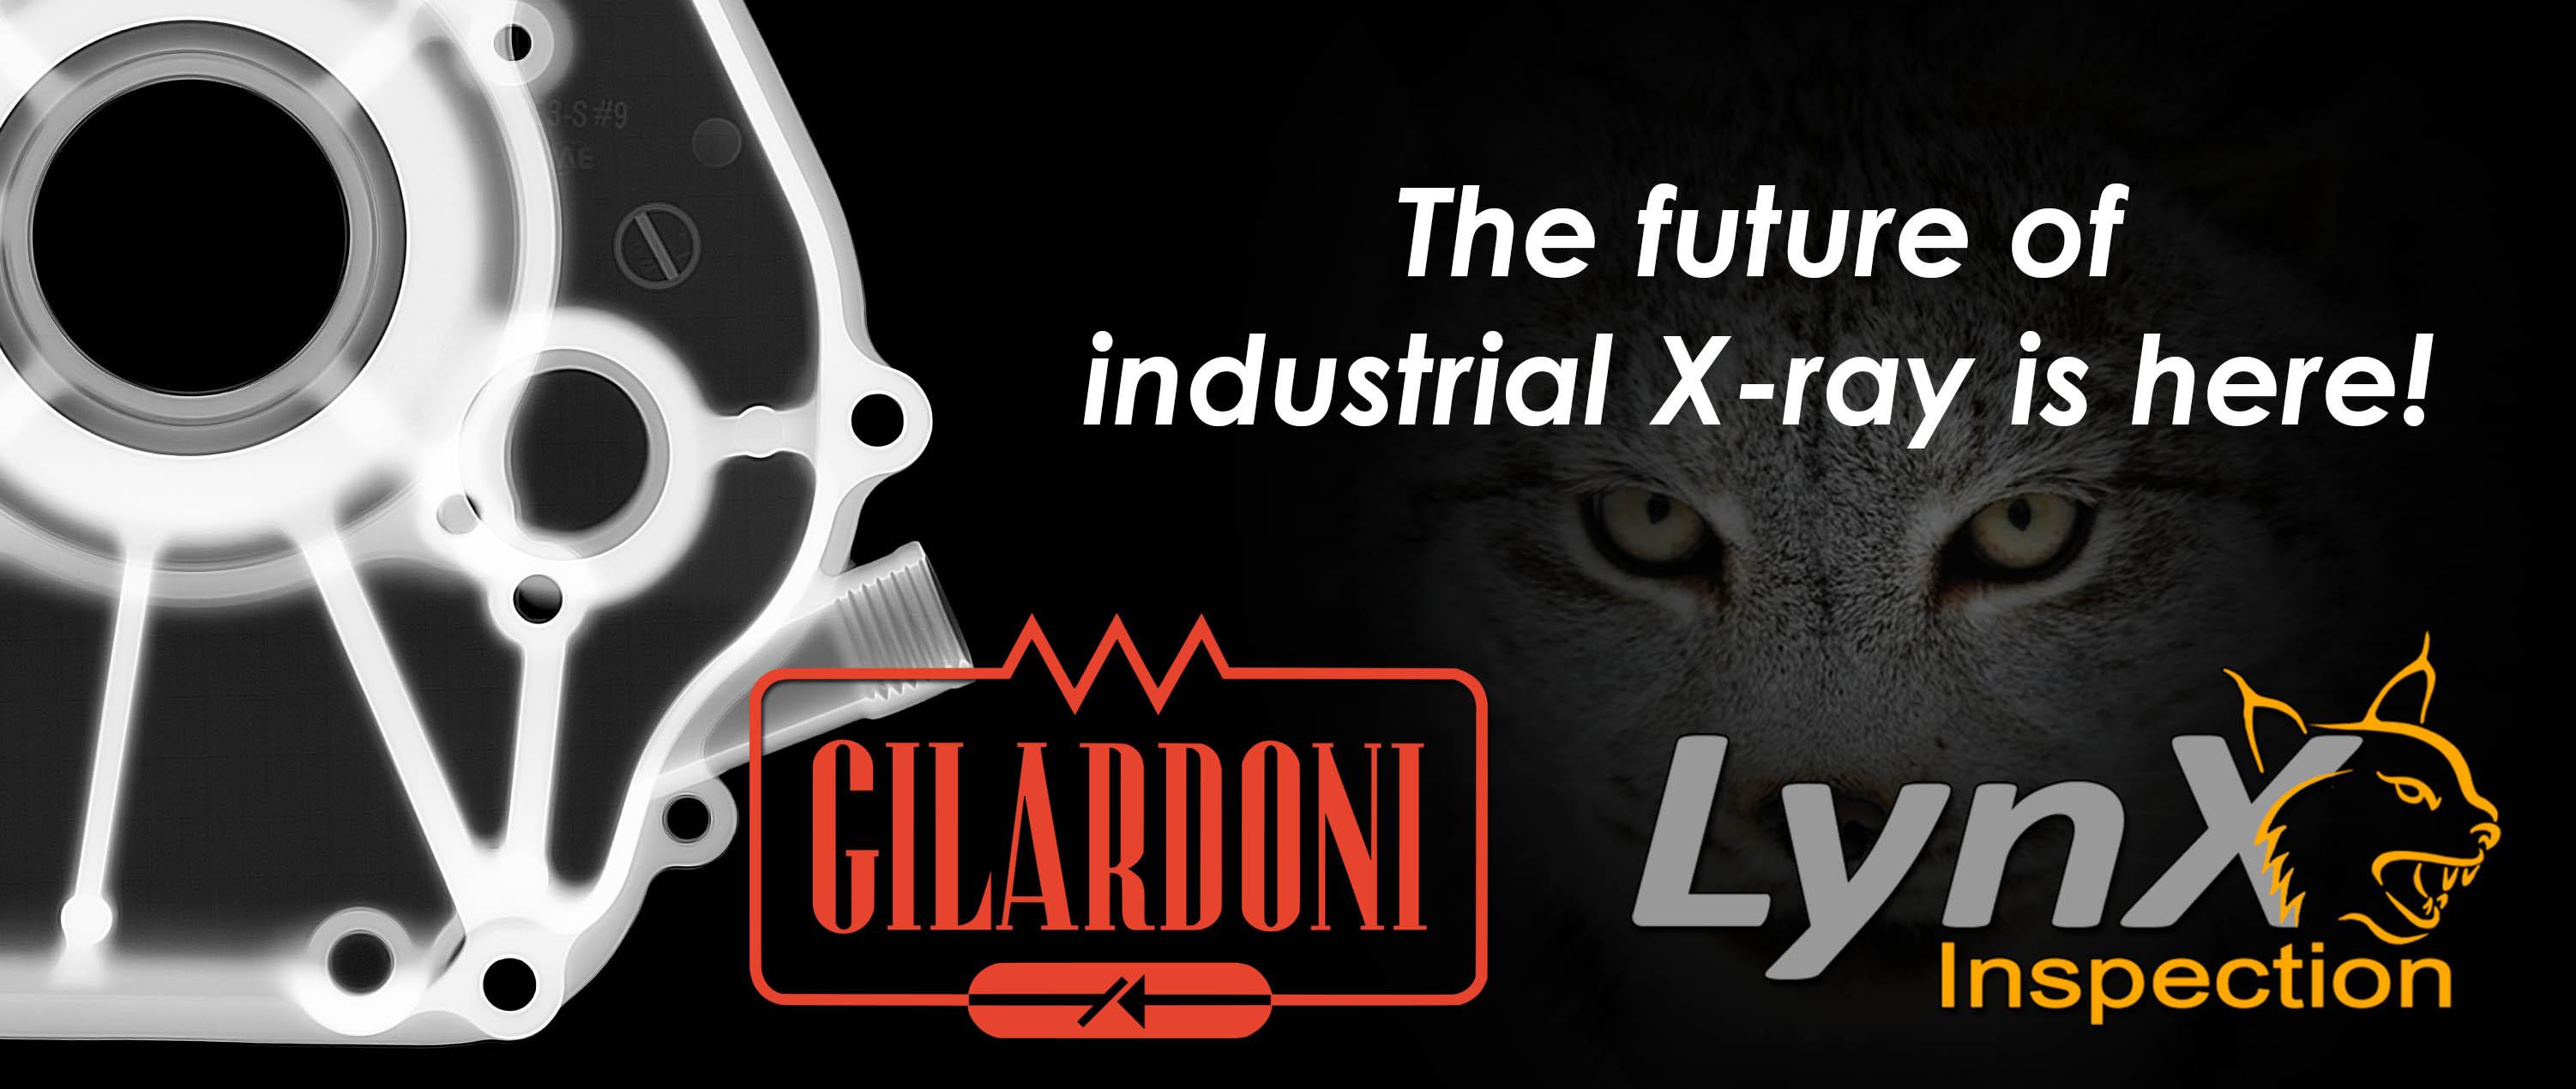 Gilardoni and LynX Inspection Announce a Strategic Partnership for the NDT Market